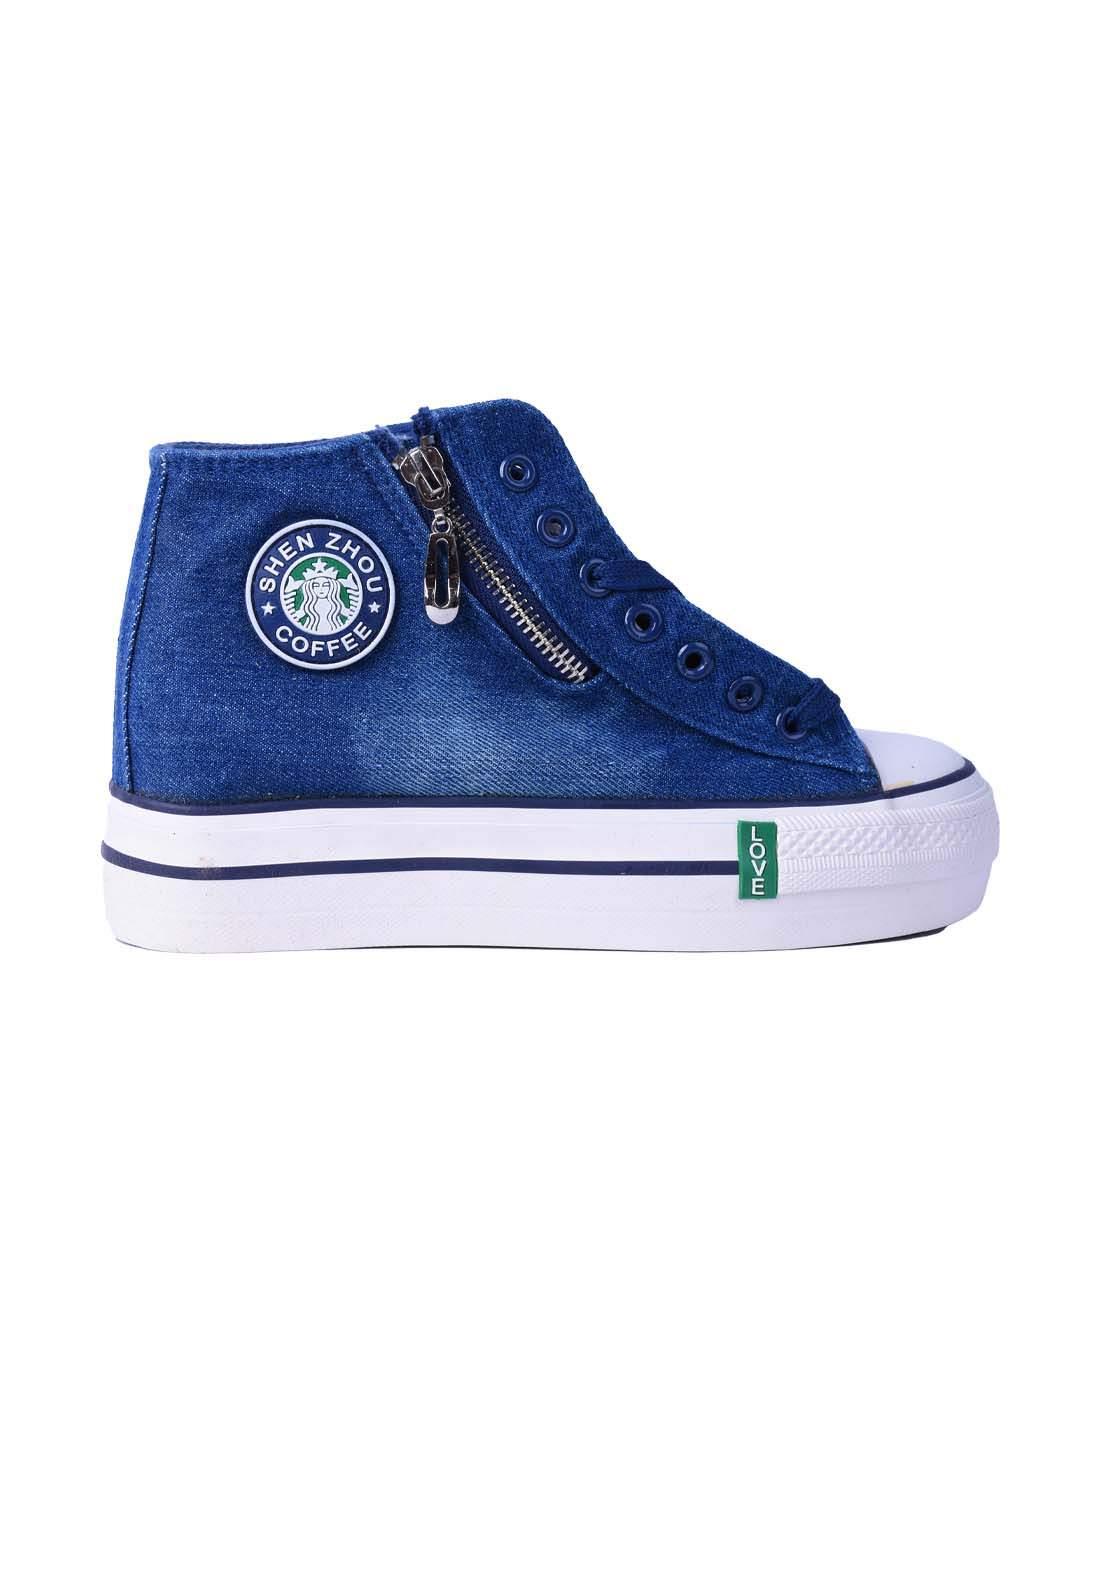 حذاء نسائي جينز ازرق اللون